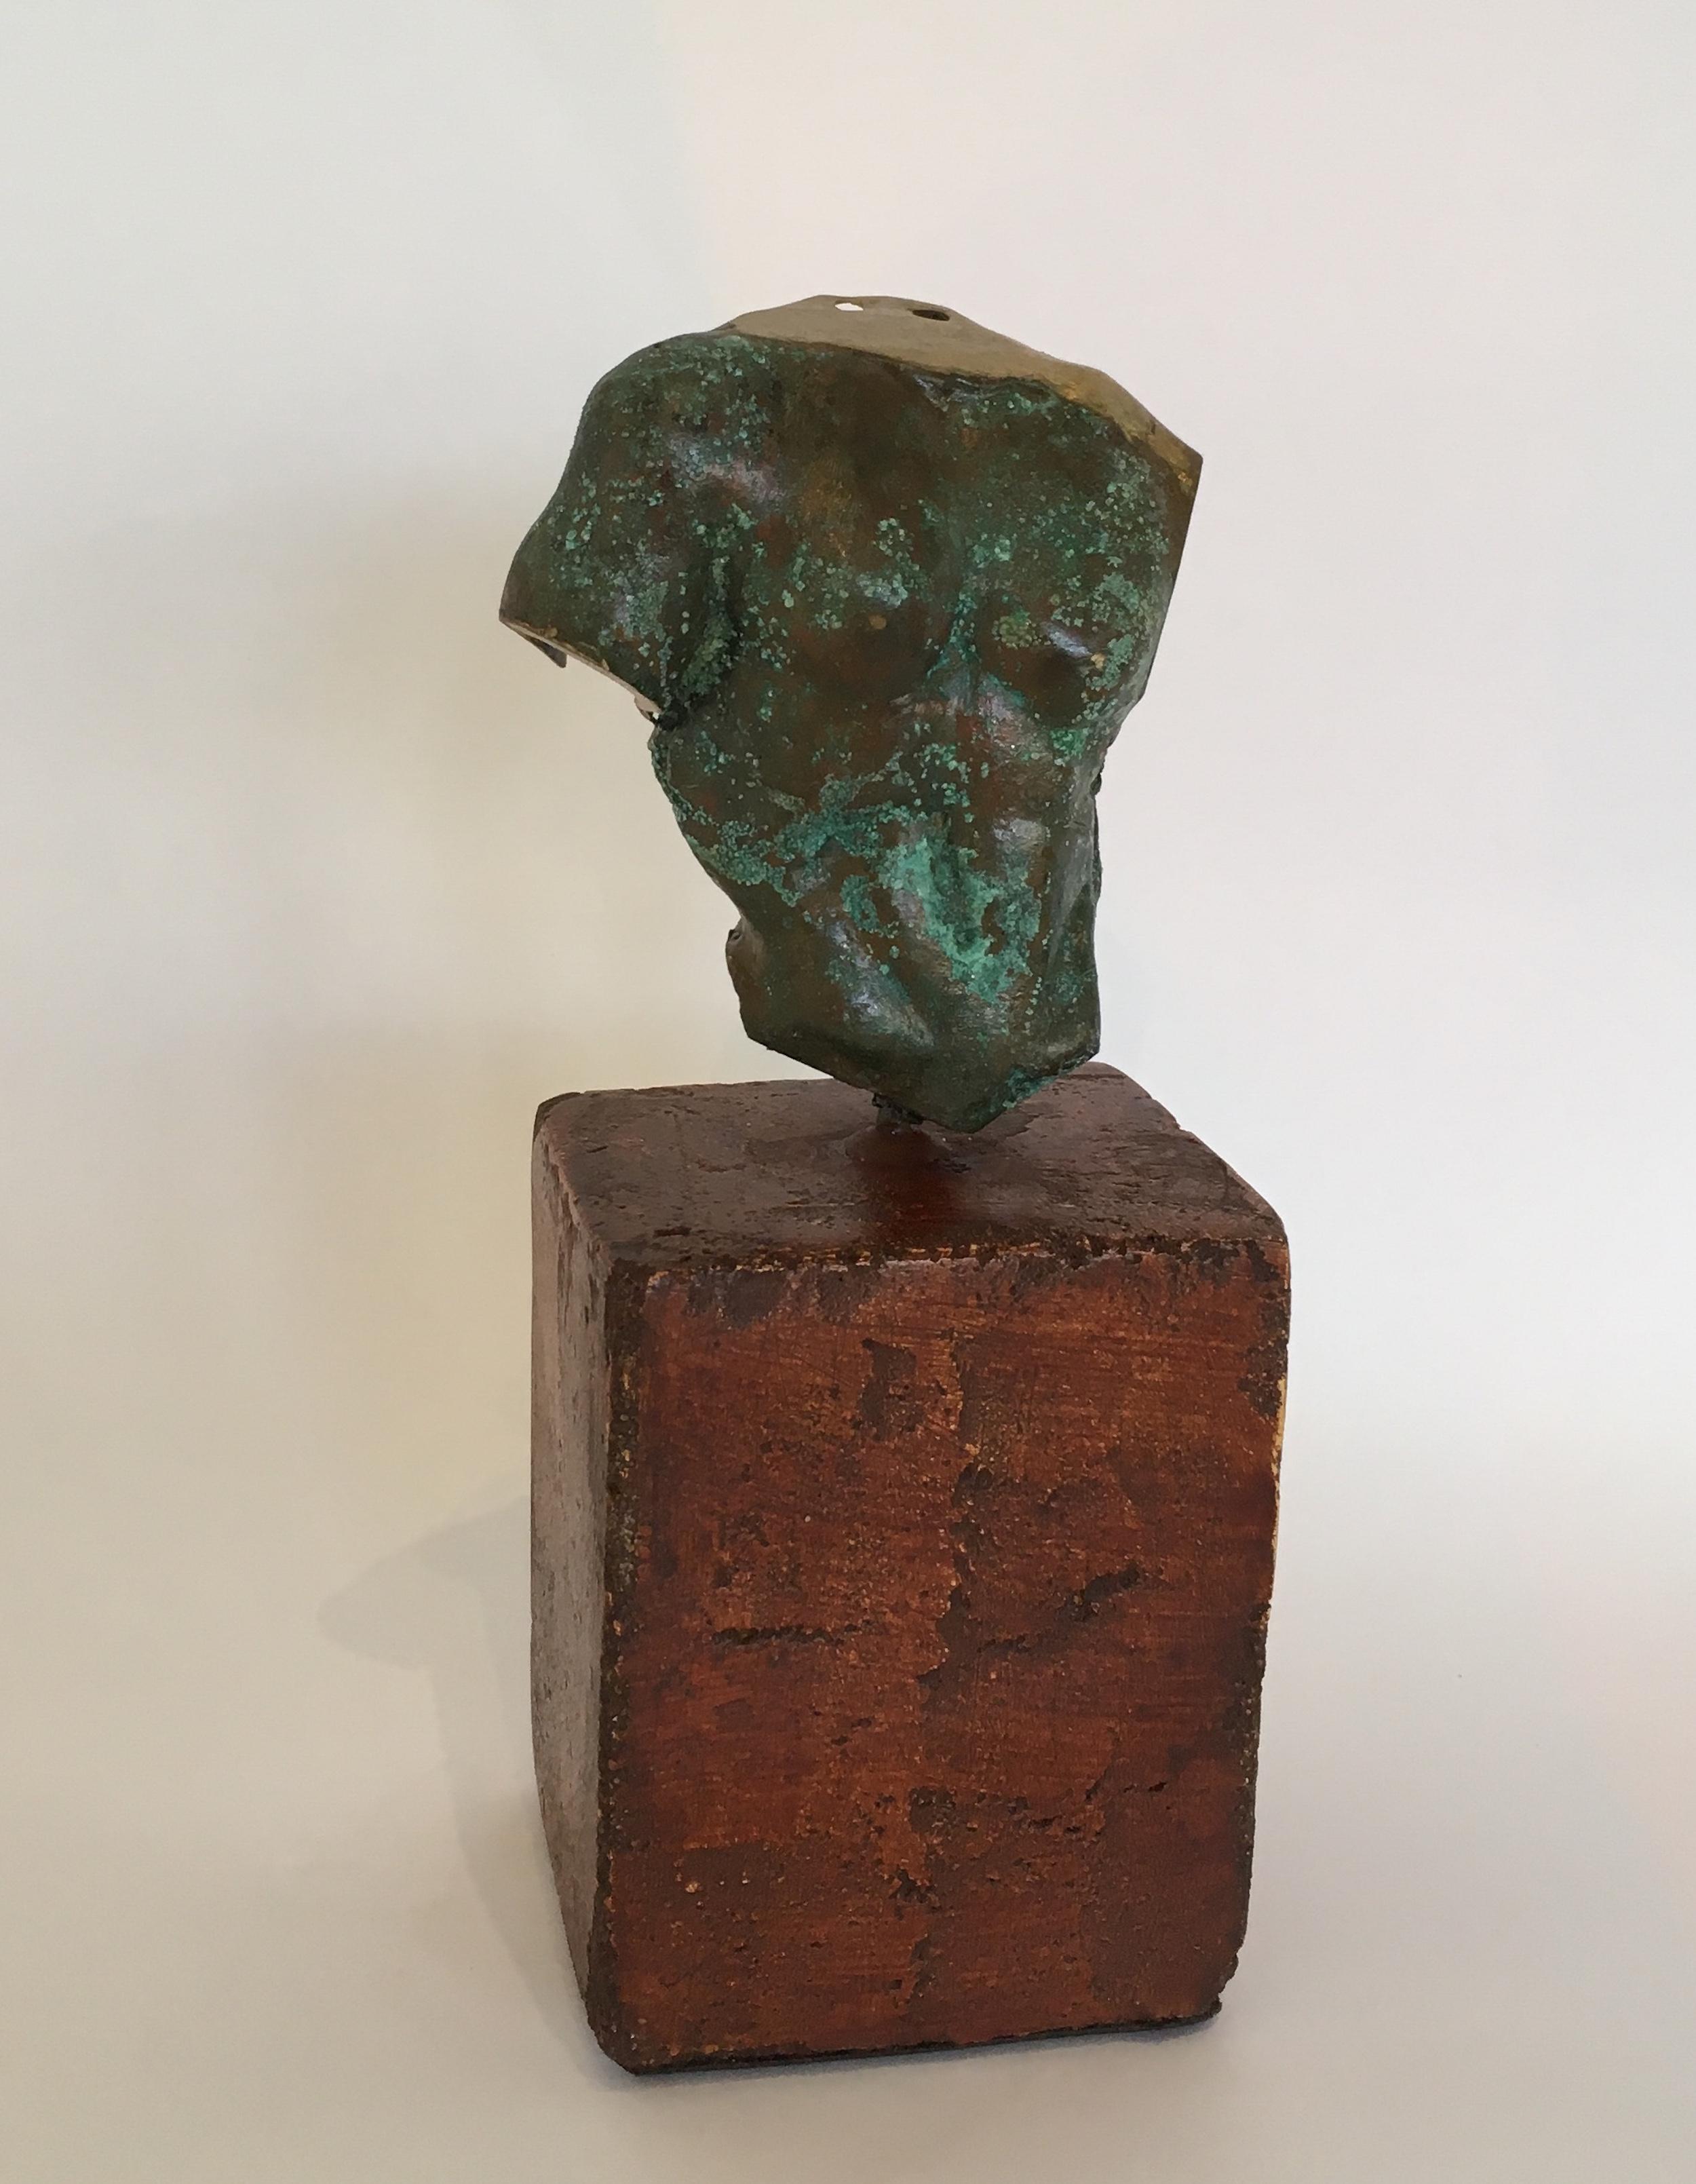 Title: Torso III  Size: H 21 cm  Medium: Bronze Edition 1/1  Price: £1500